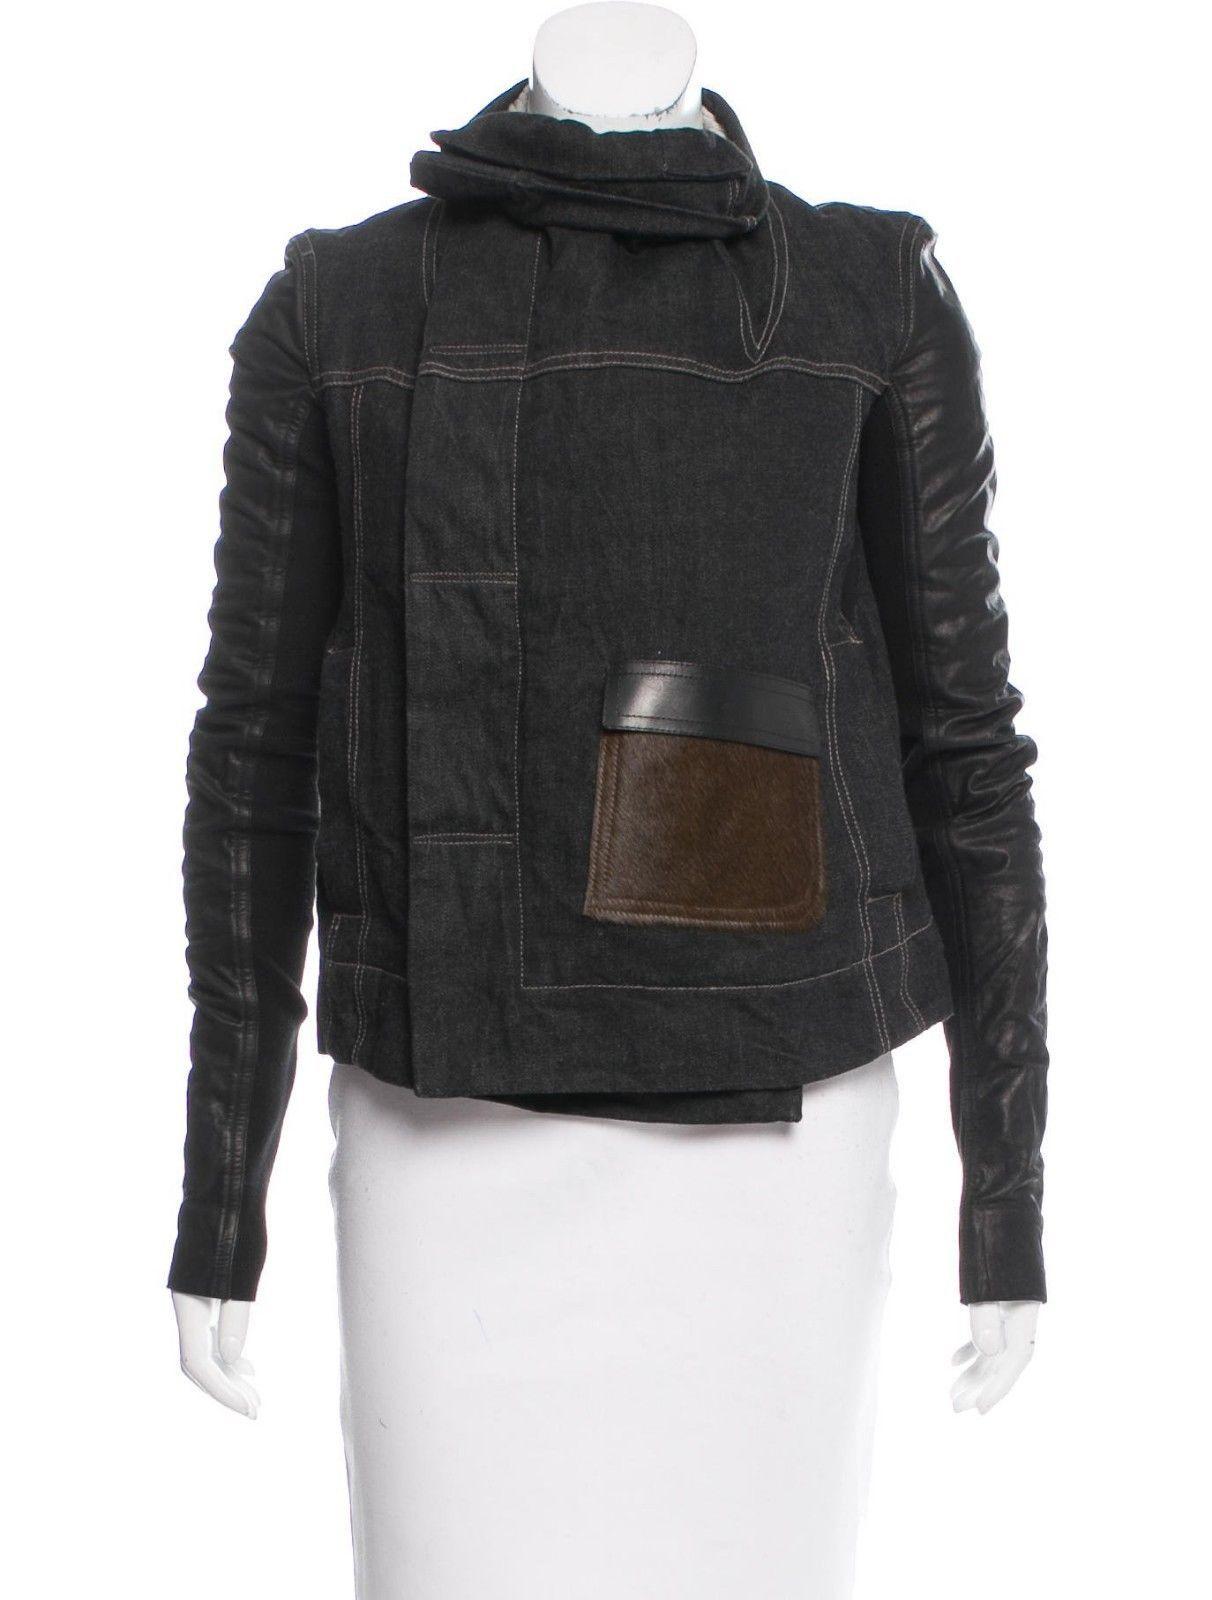 5f485f0ebfa8 Rick owens sale! drkshdw calf fur thick denim leather jacket size ...